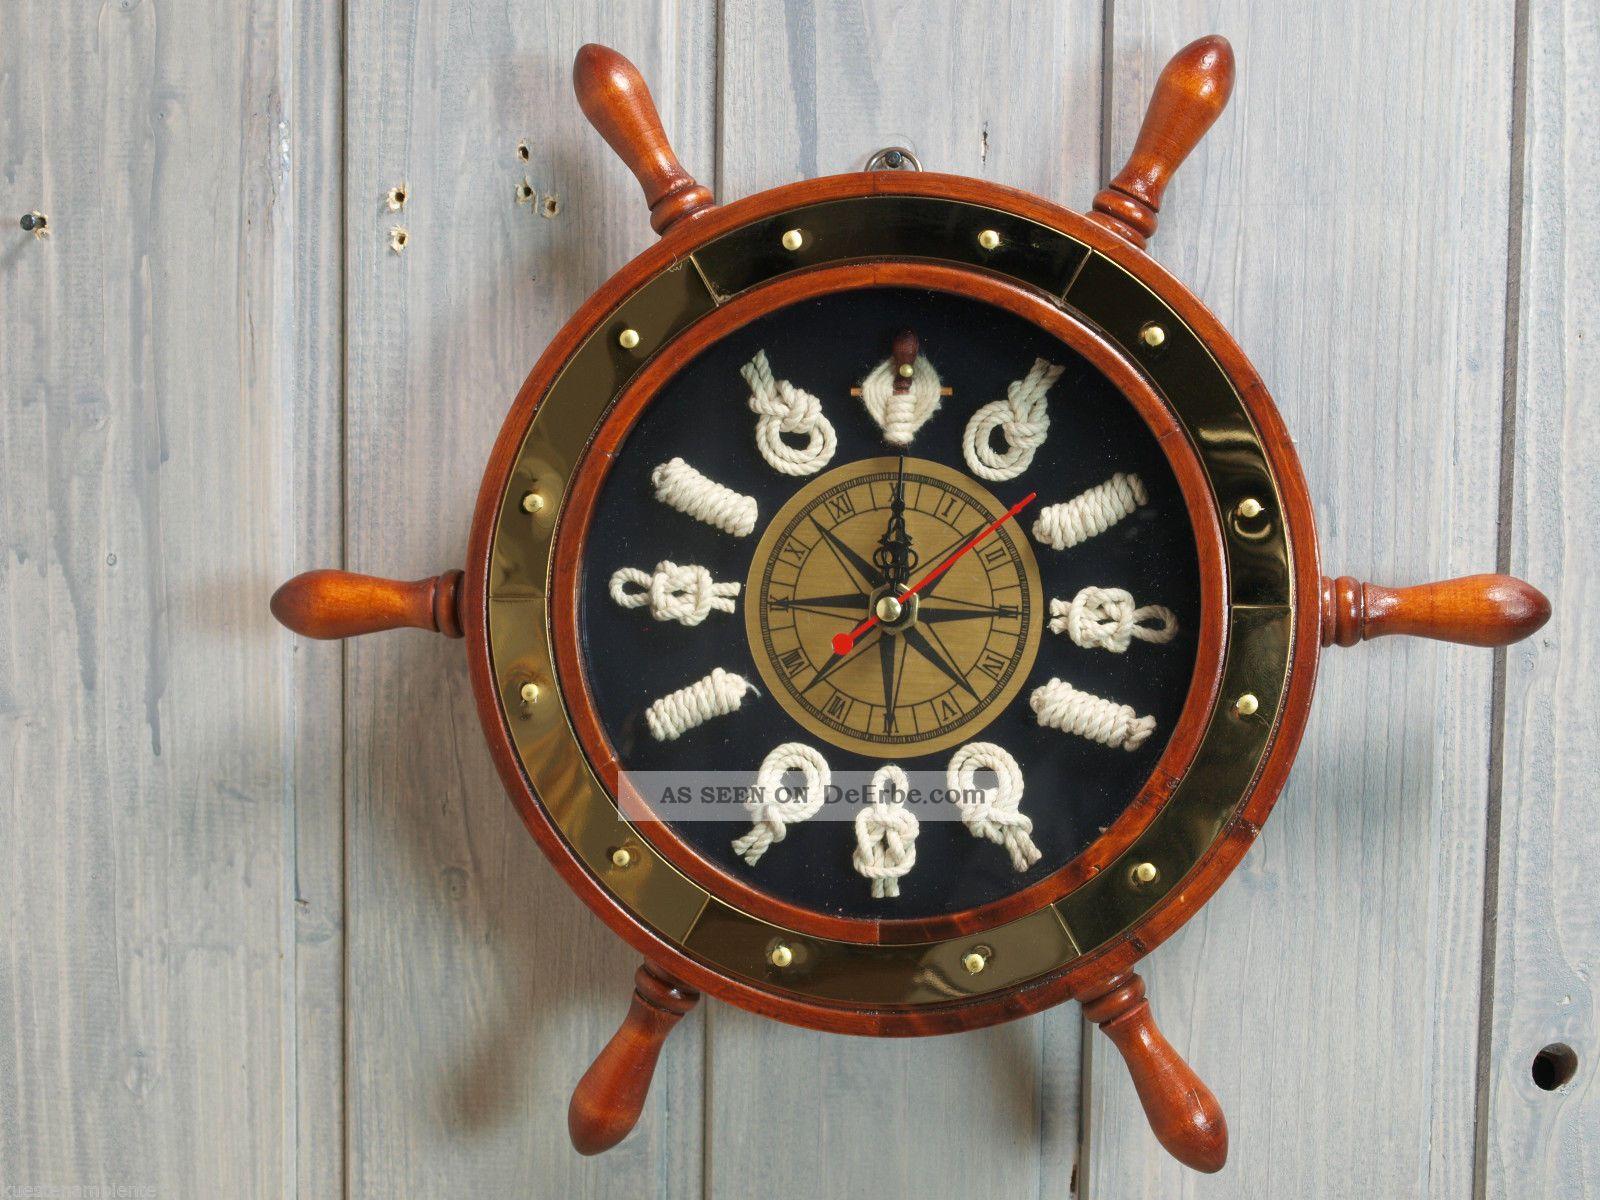 maritime uhr steuerrad aus holz durchmesser 28cm. Black Bedroom Furniture Sets. Home Design Ideas